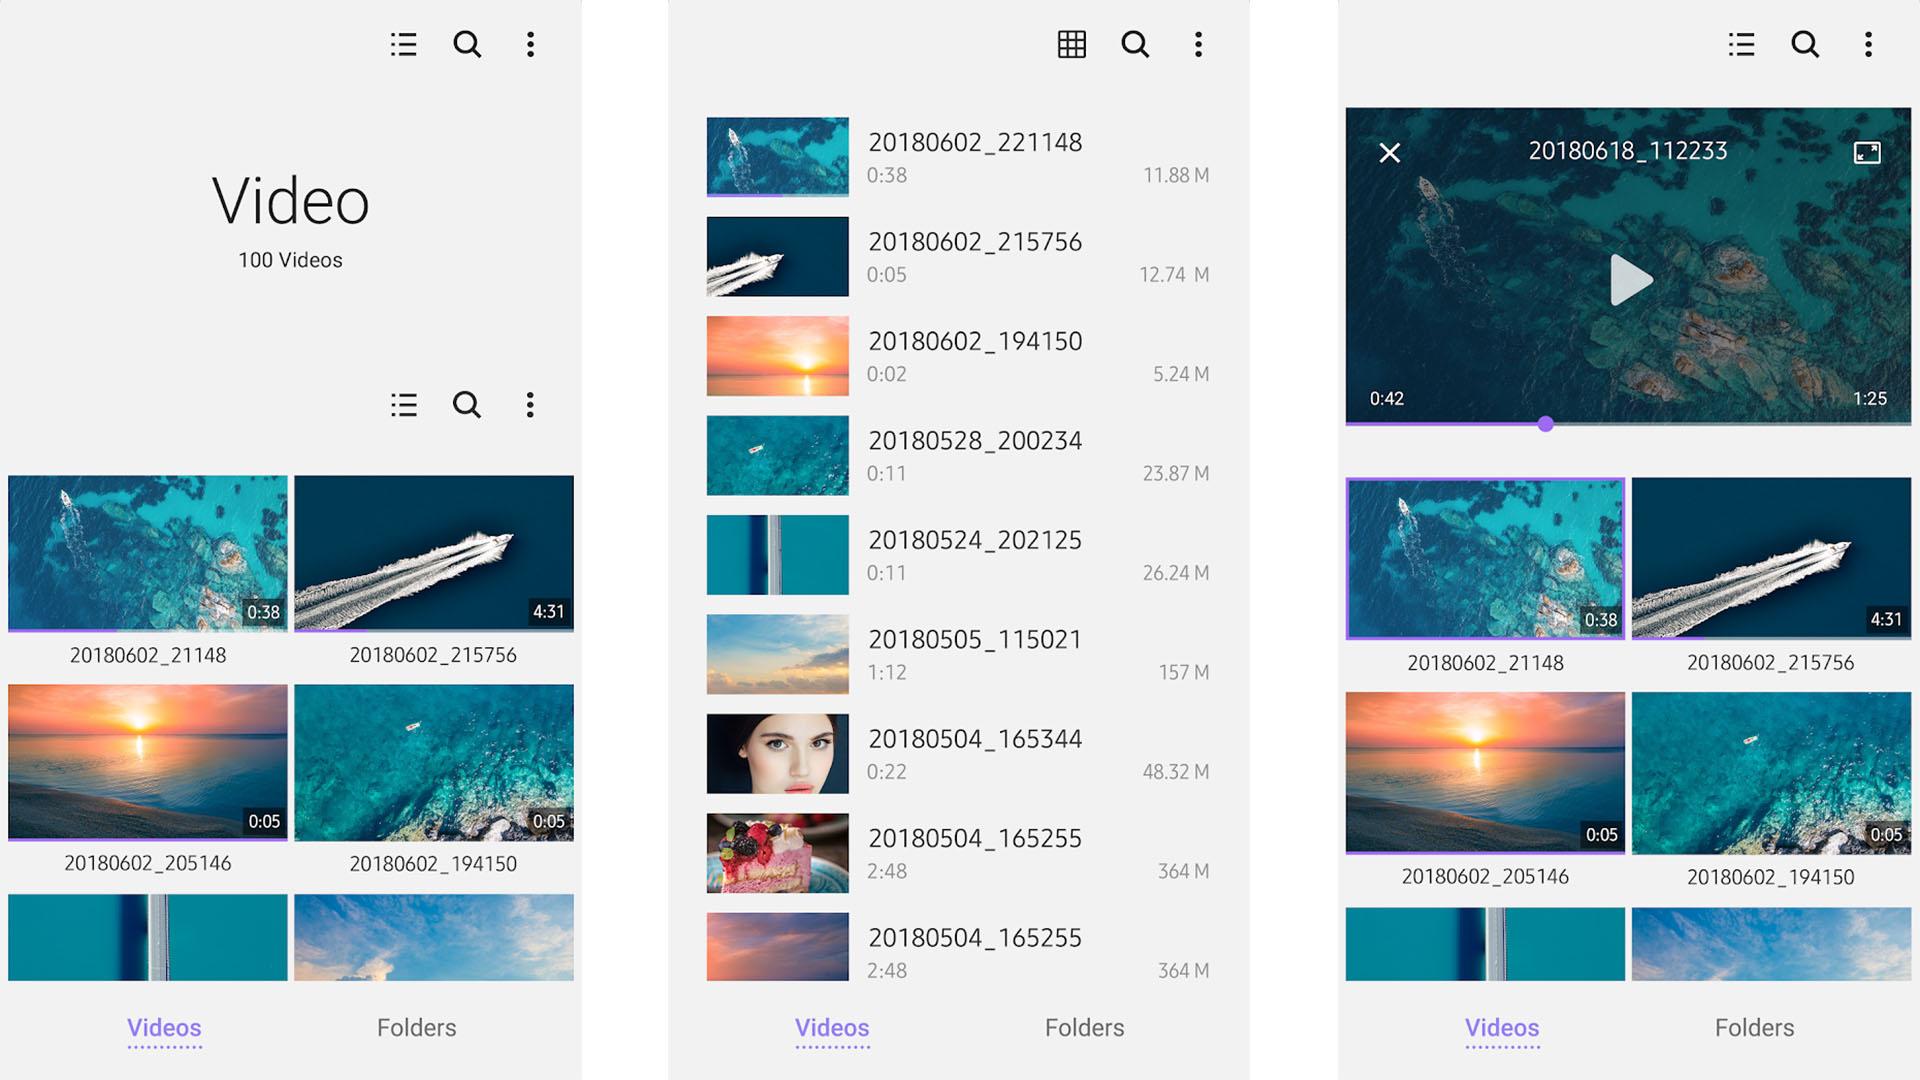 Samsung Video Library screenshot 2021